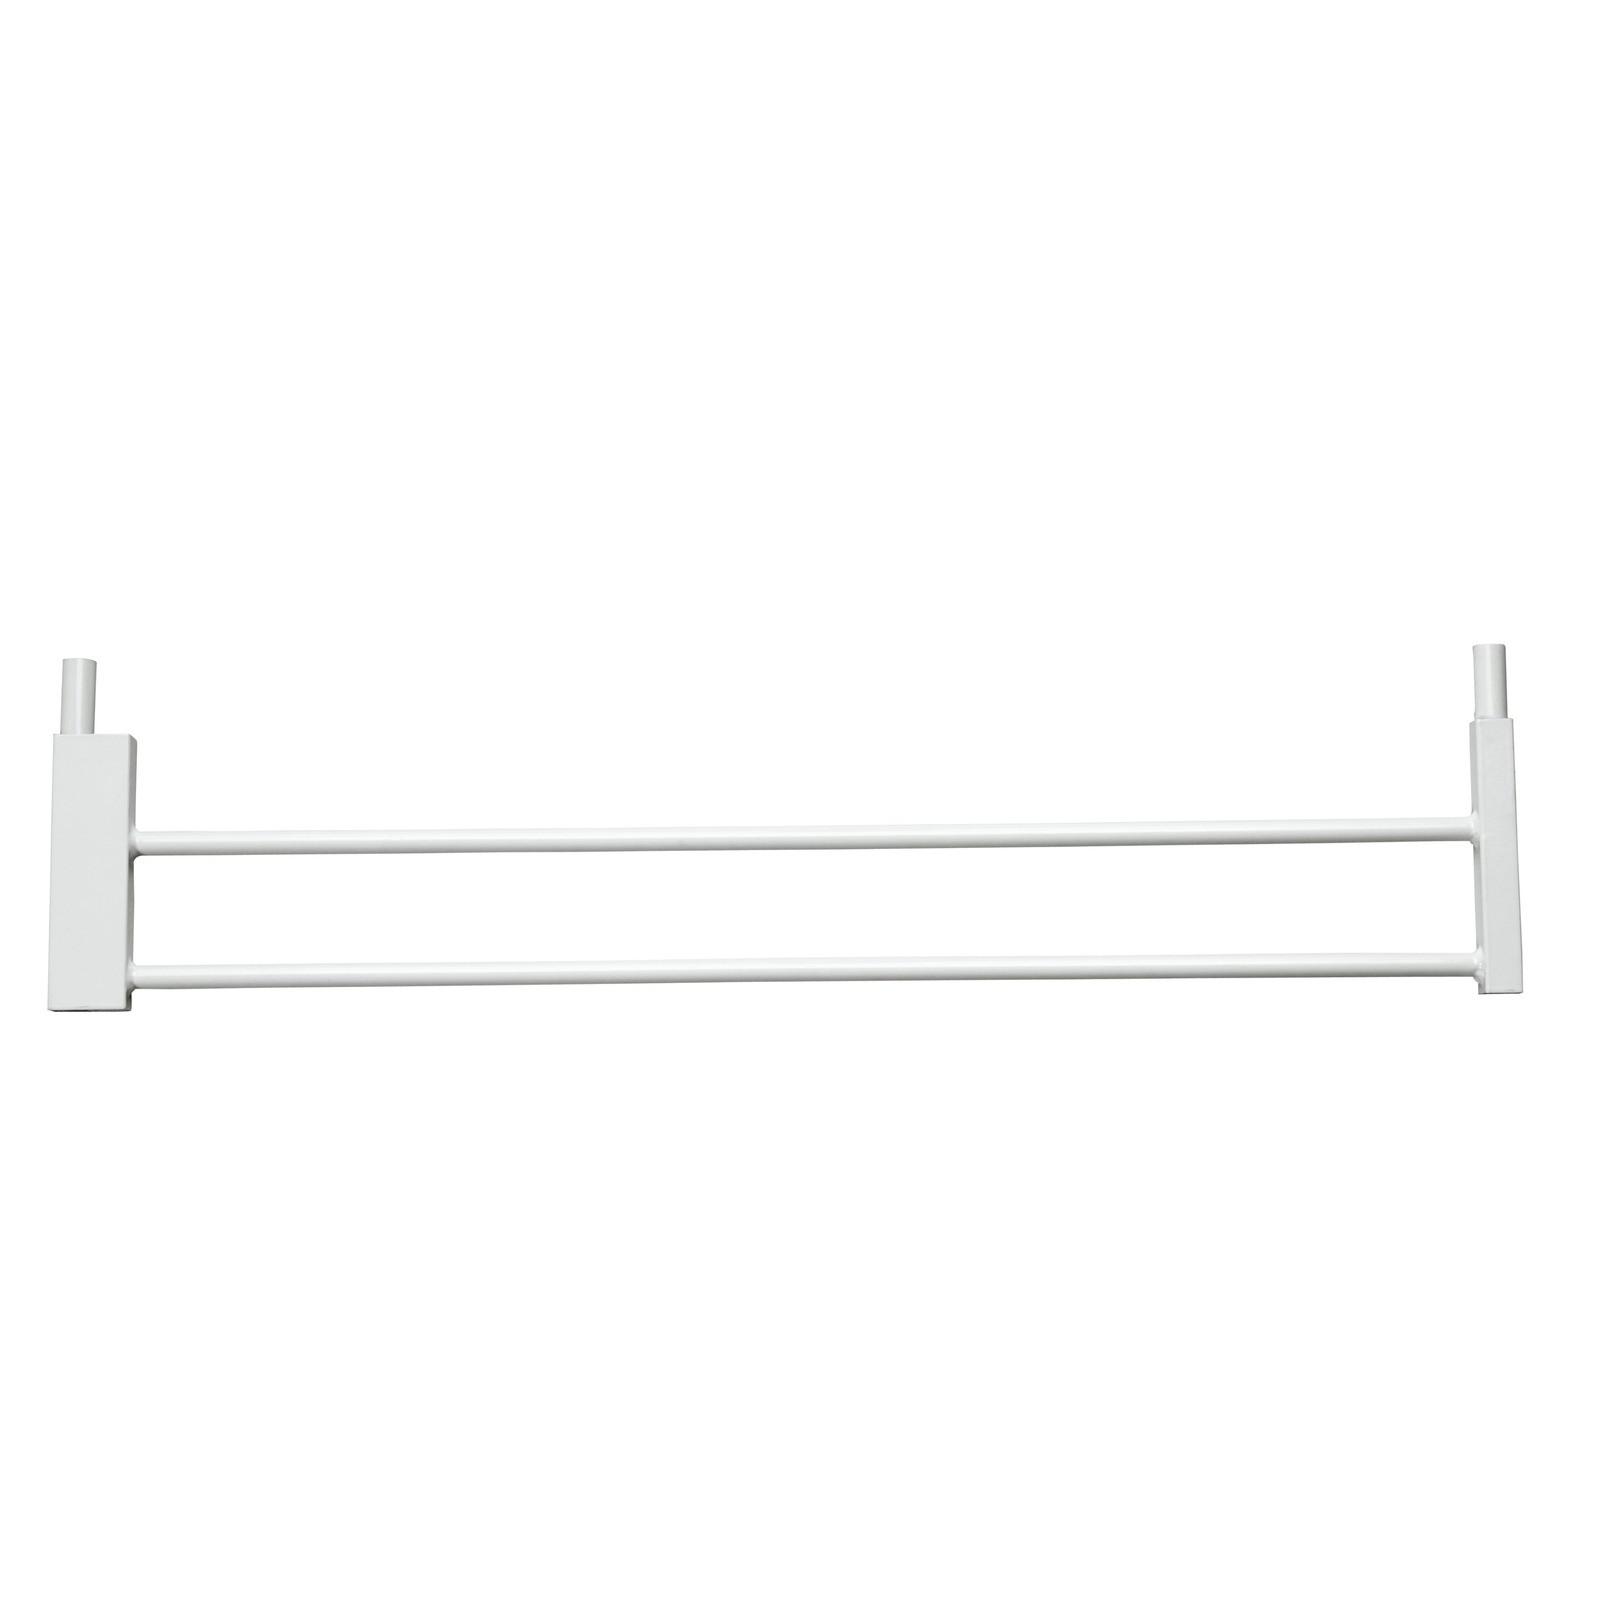 Chicco Extension Barrière de Protection - 144 mm